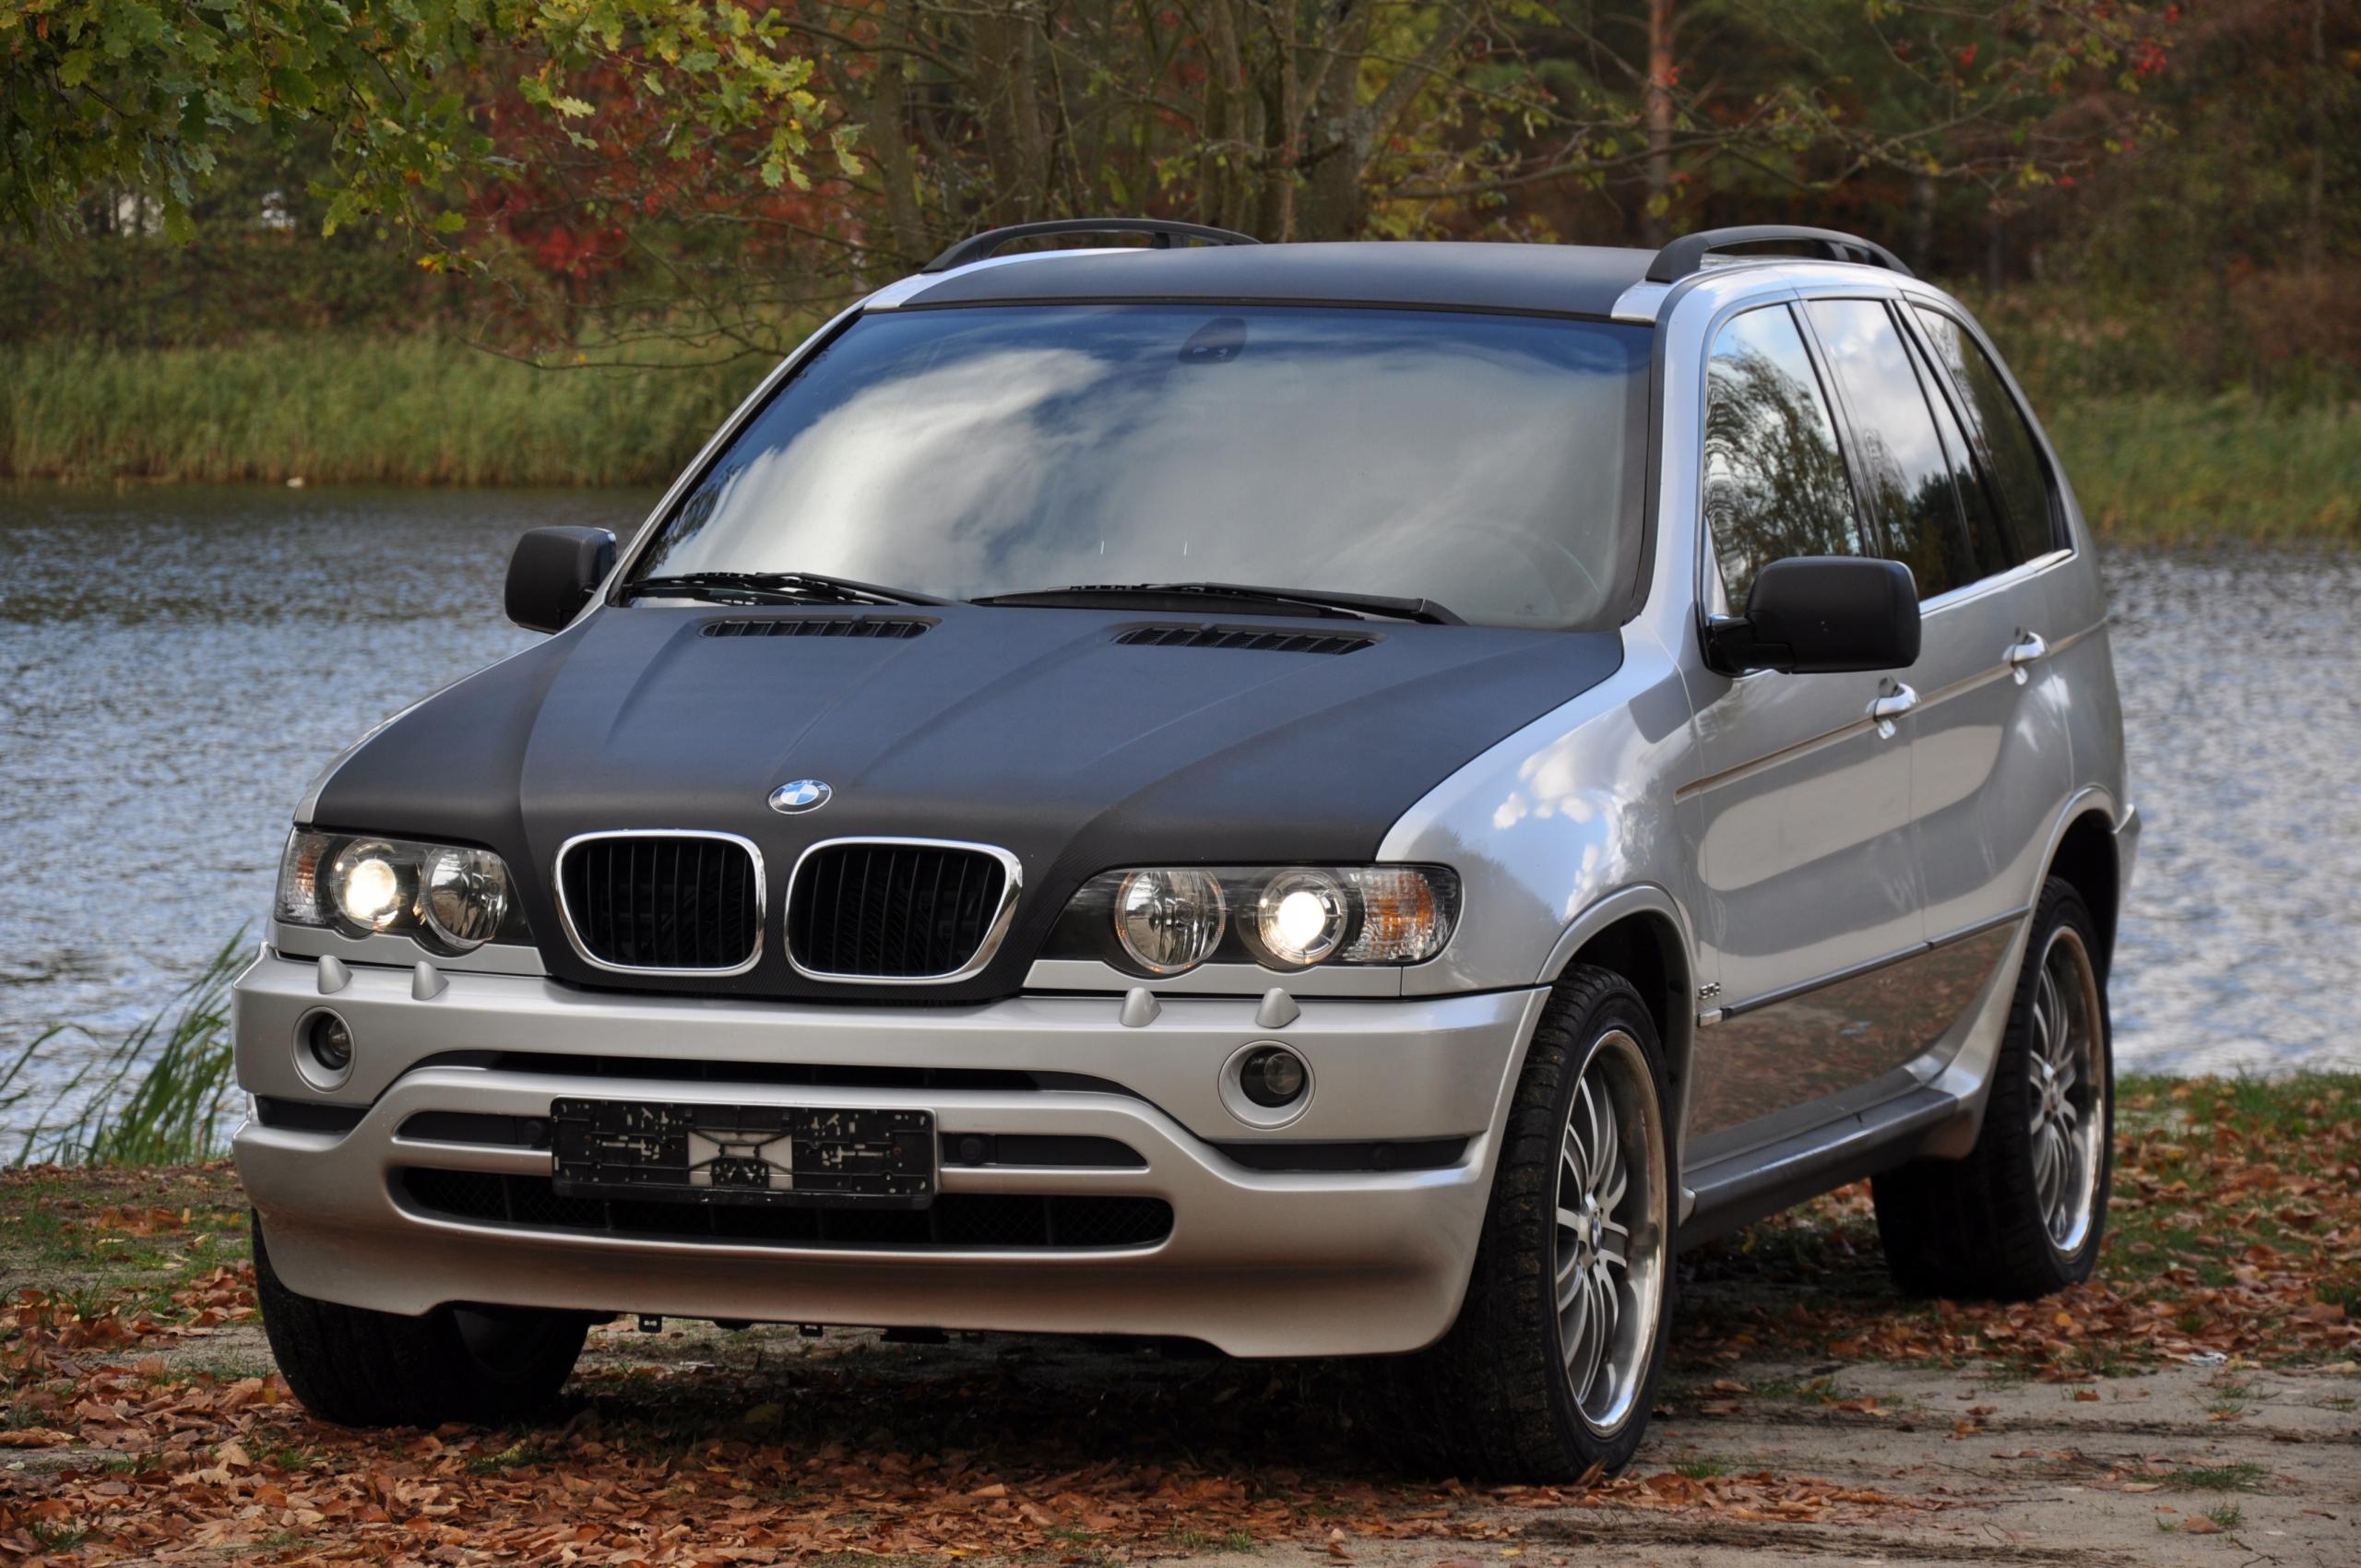 BMW X5 E53 3.0d 228km Xenon sport pakiet fullopcja